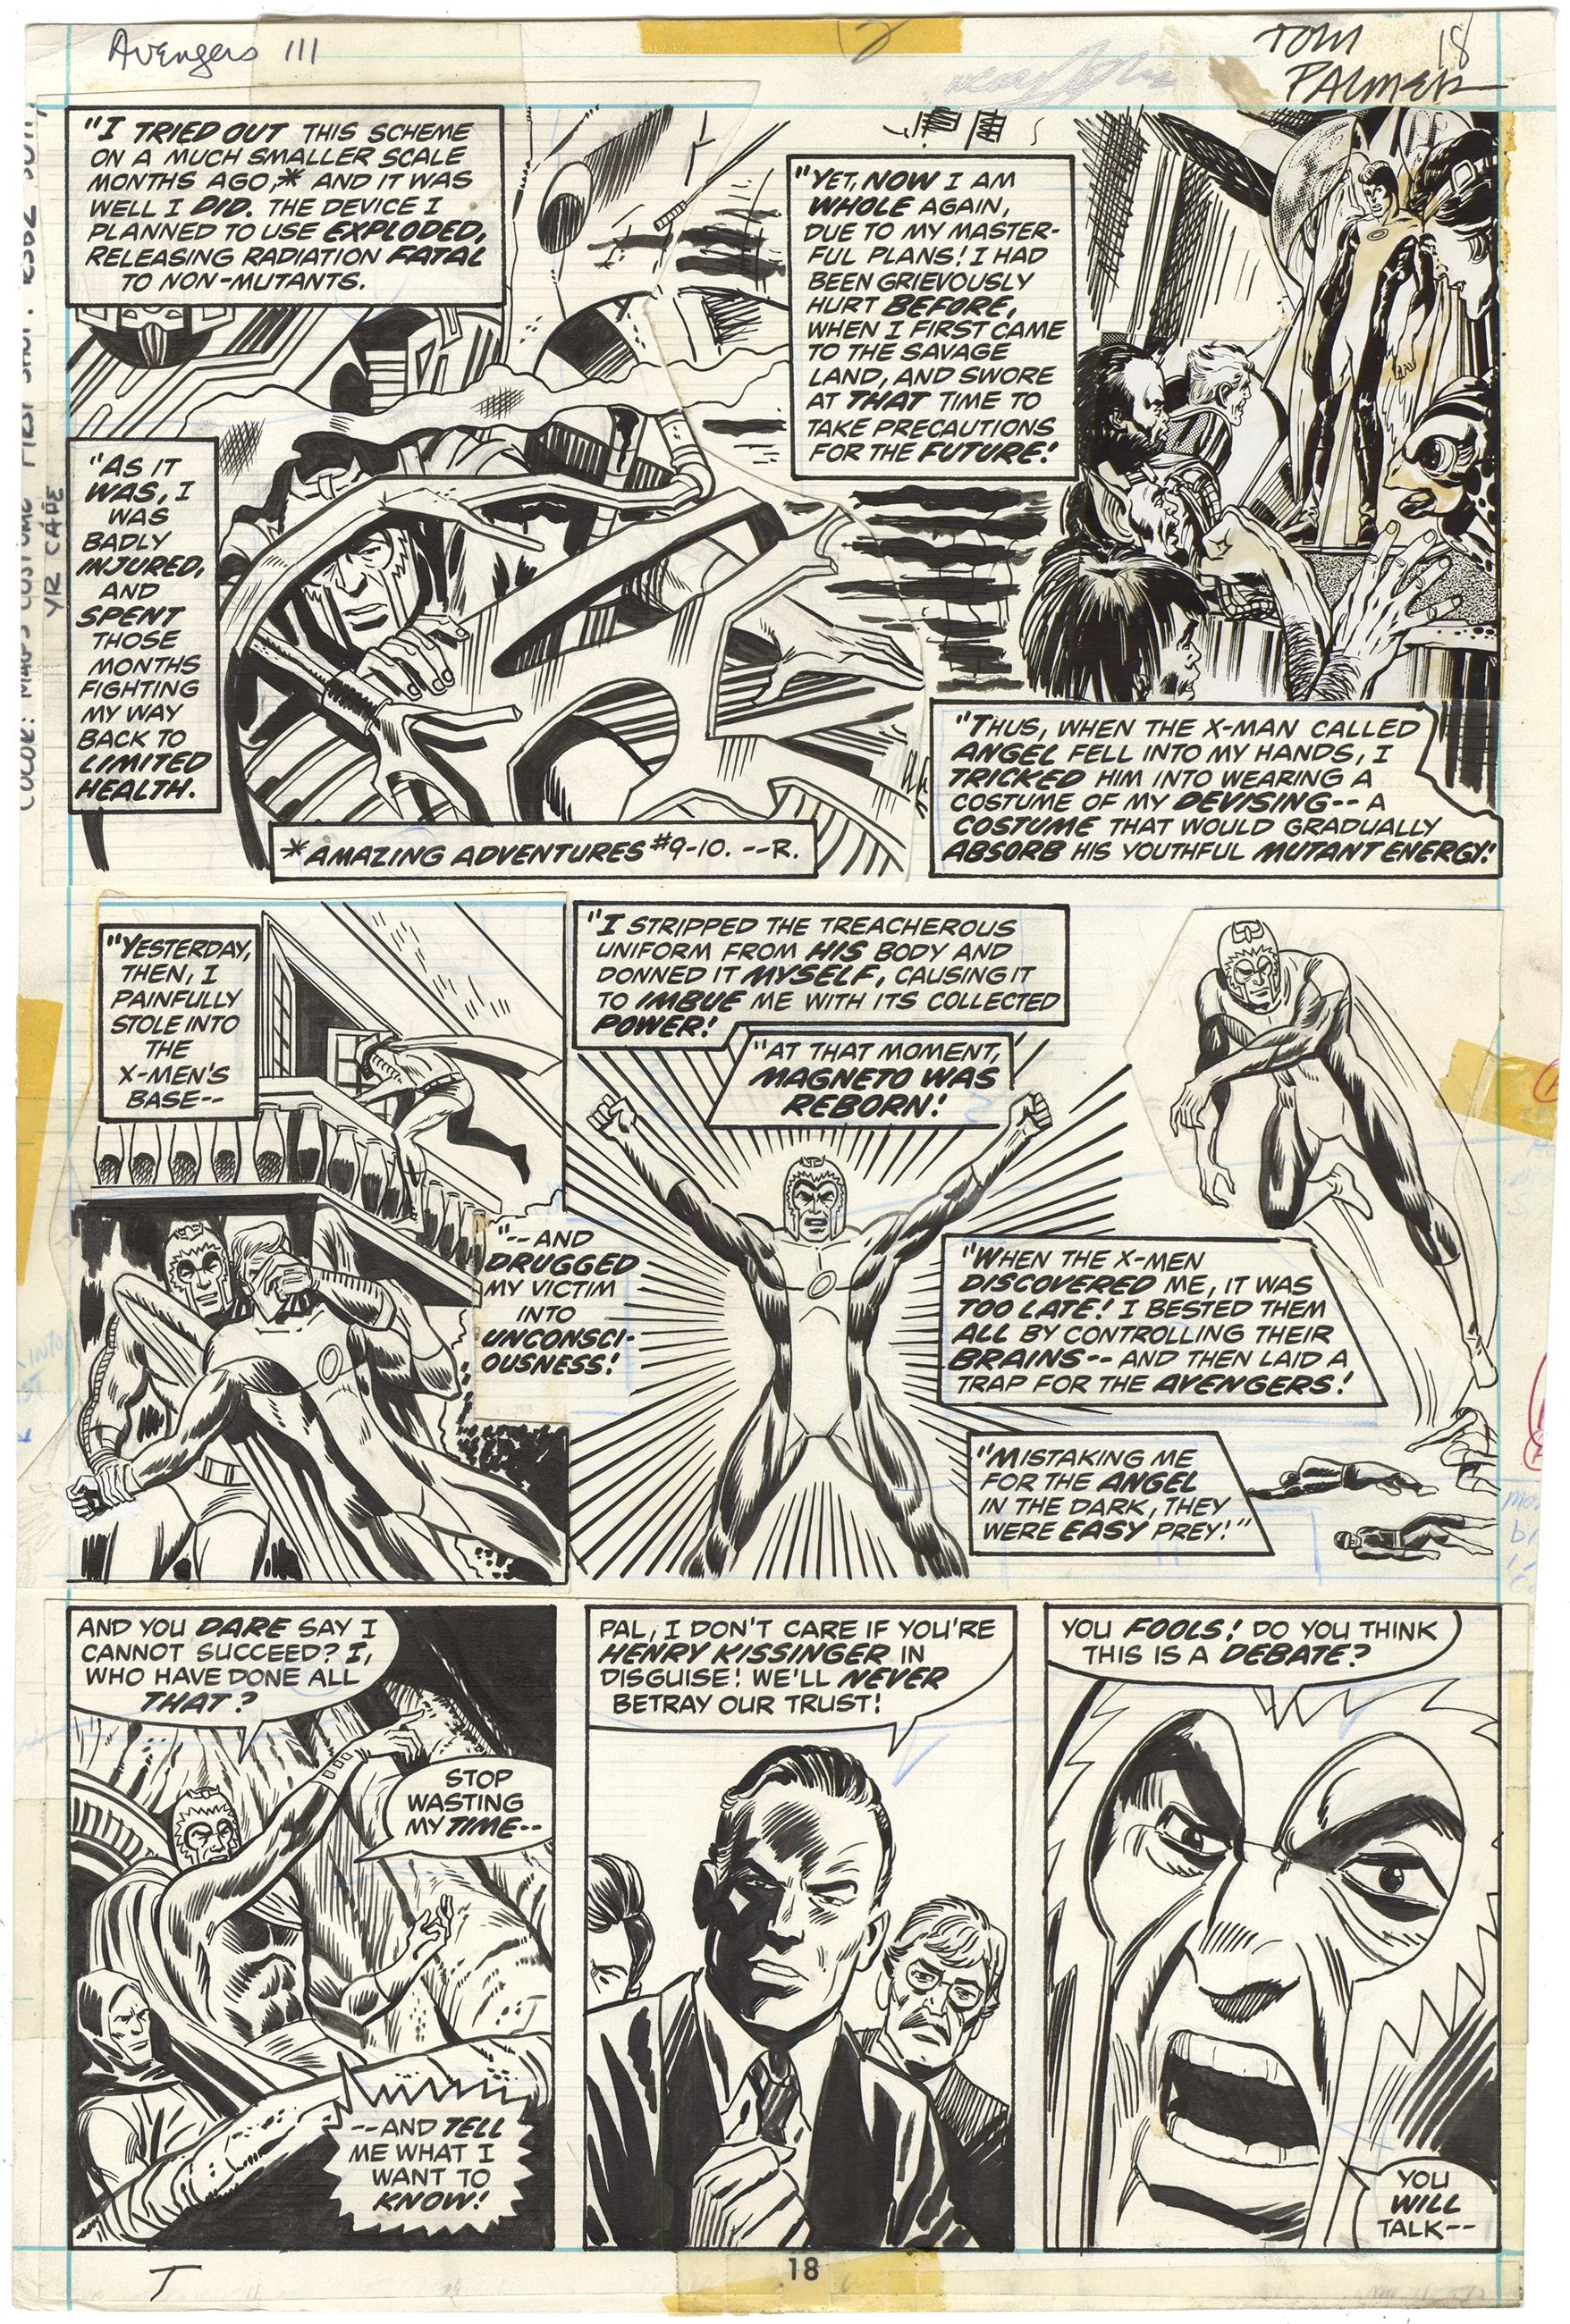 Avengers #111 p18